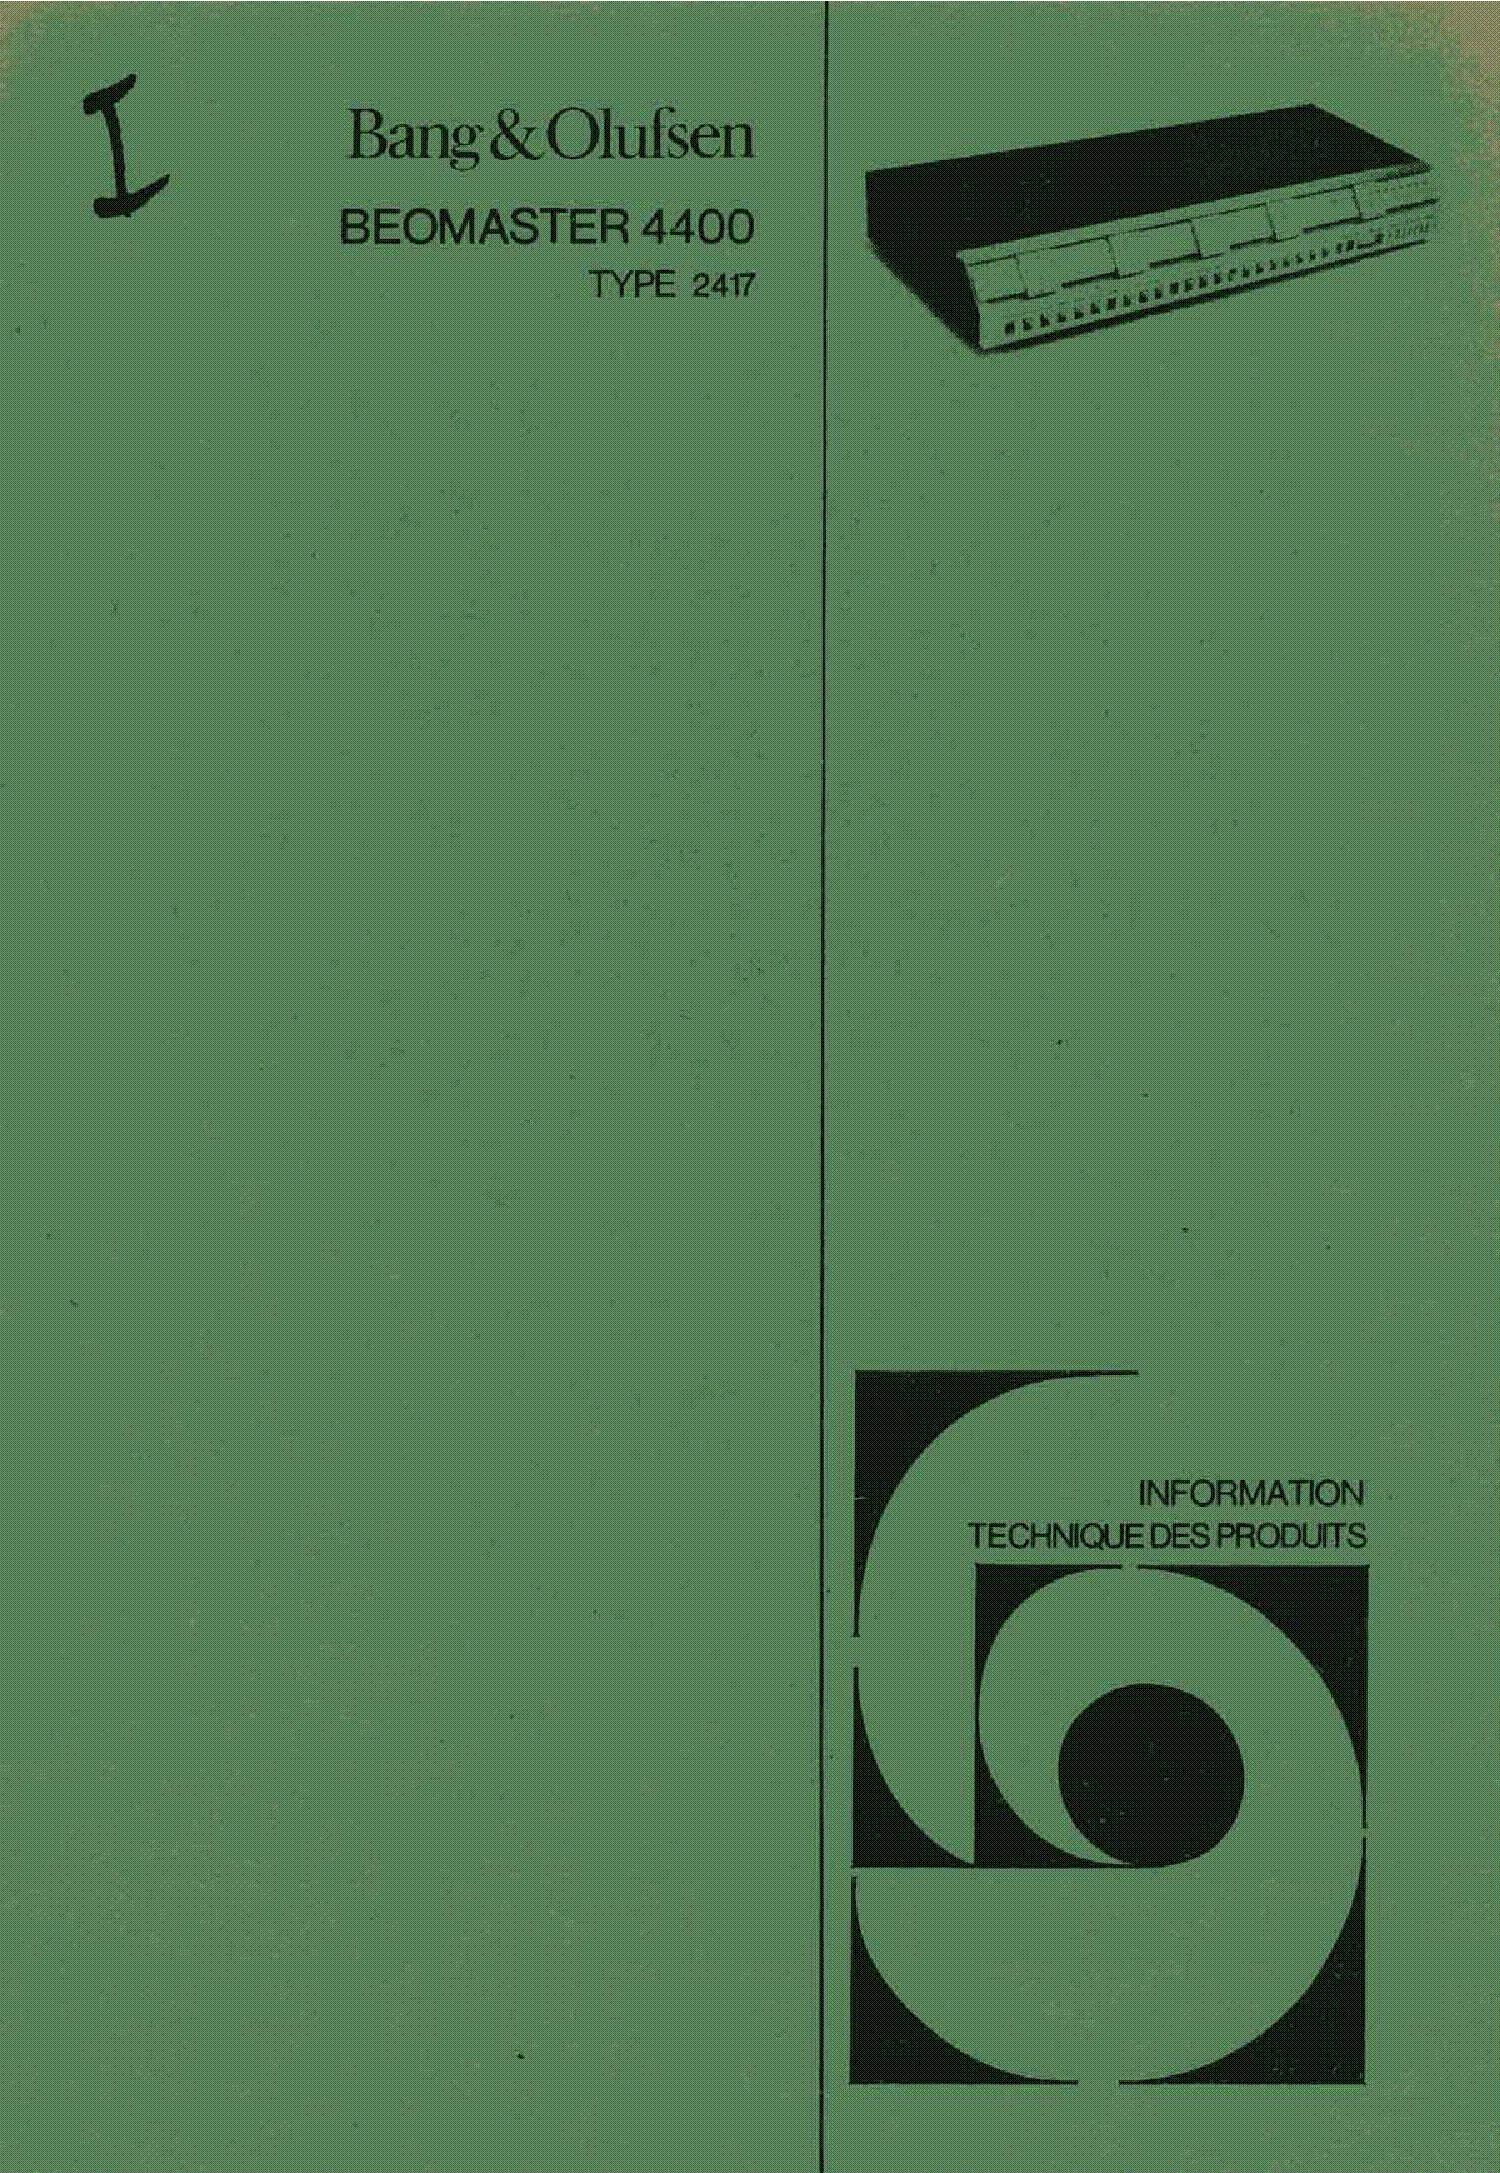 Bang-olufsen beomaster-4400 service manual download, schematics.